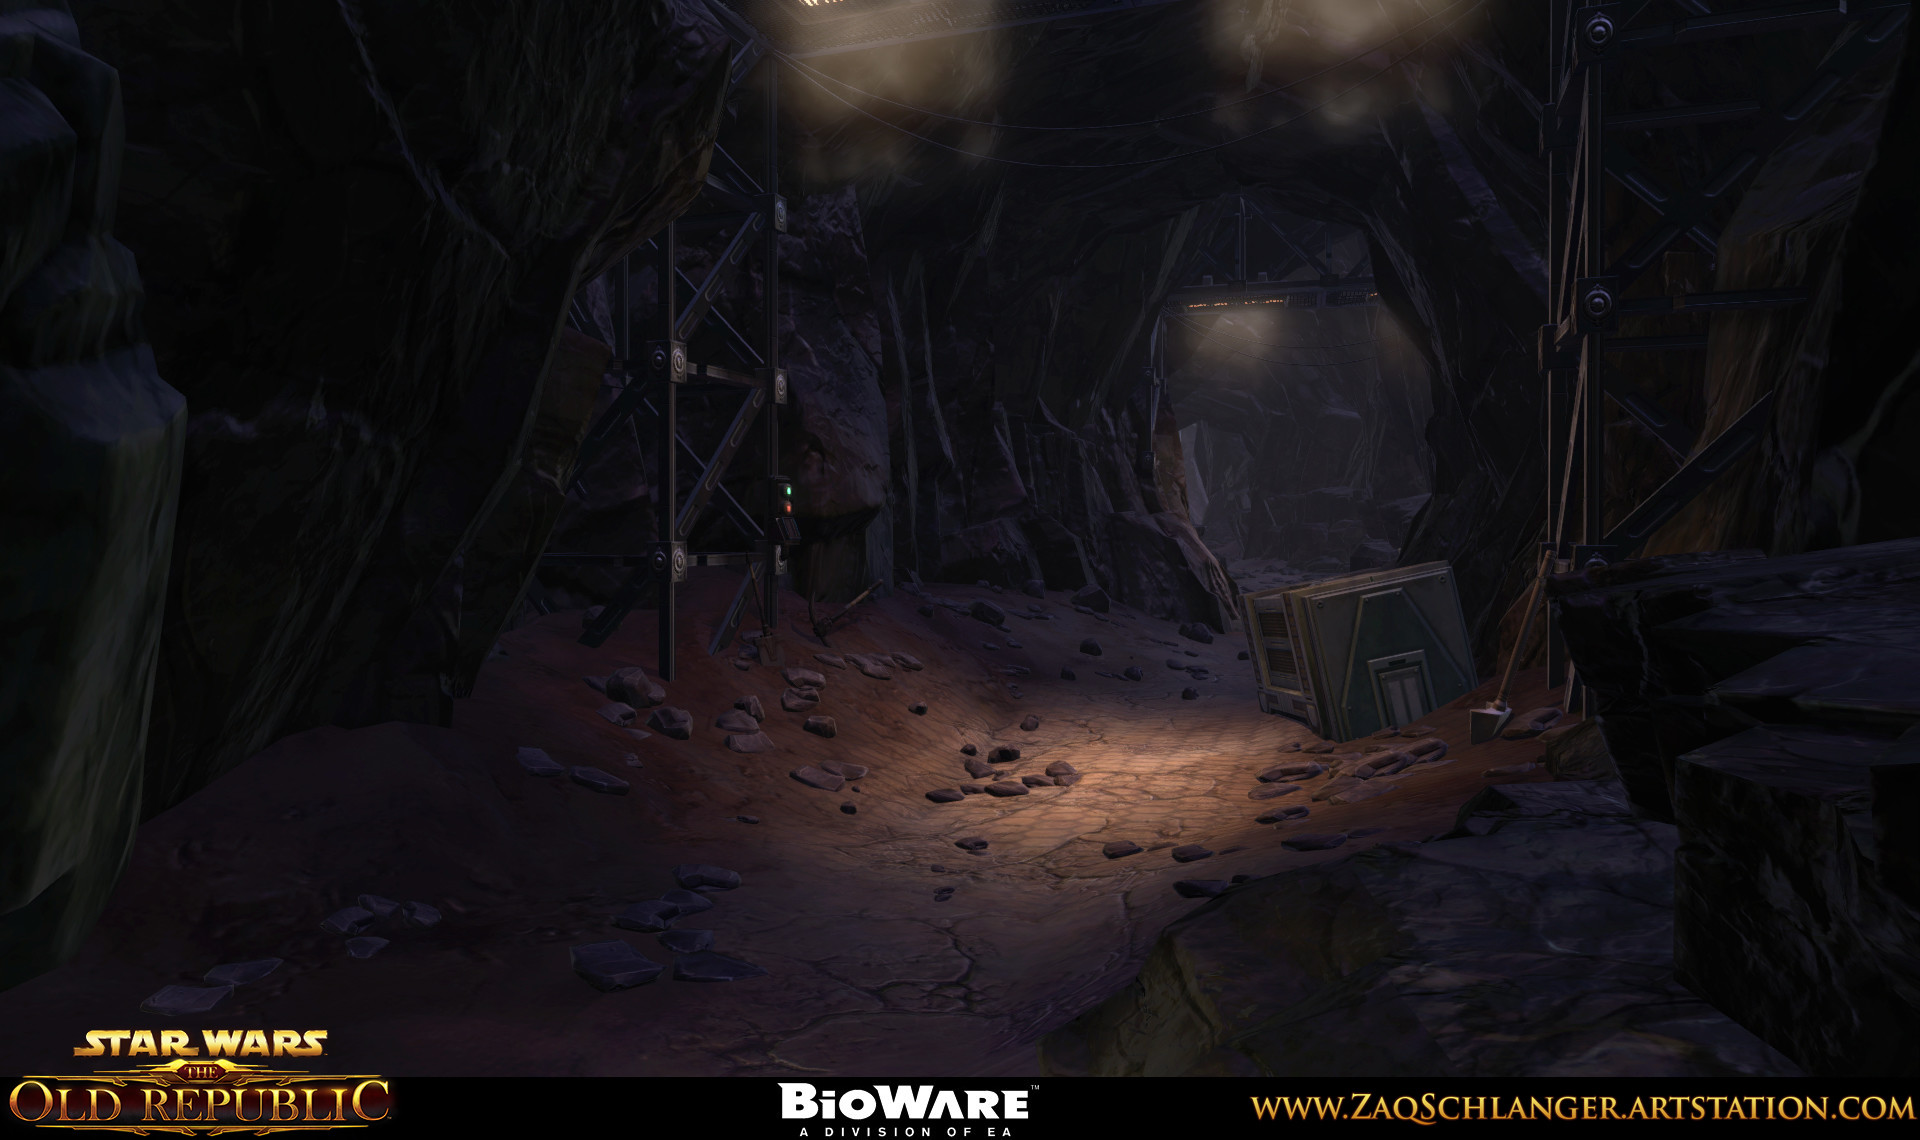 Zachary schlanger zaqschlanger copero caves natural 01